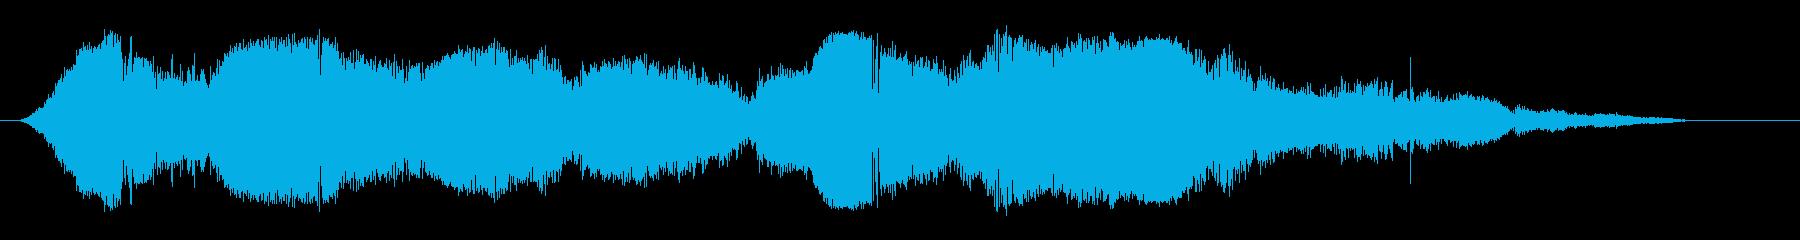 GTSカー;アウトオブターン(7 ...の再生済みの波形